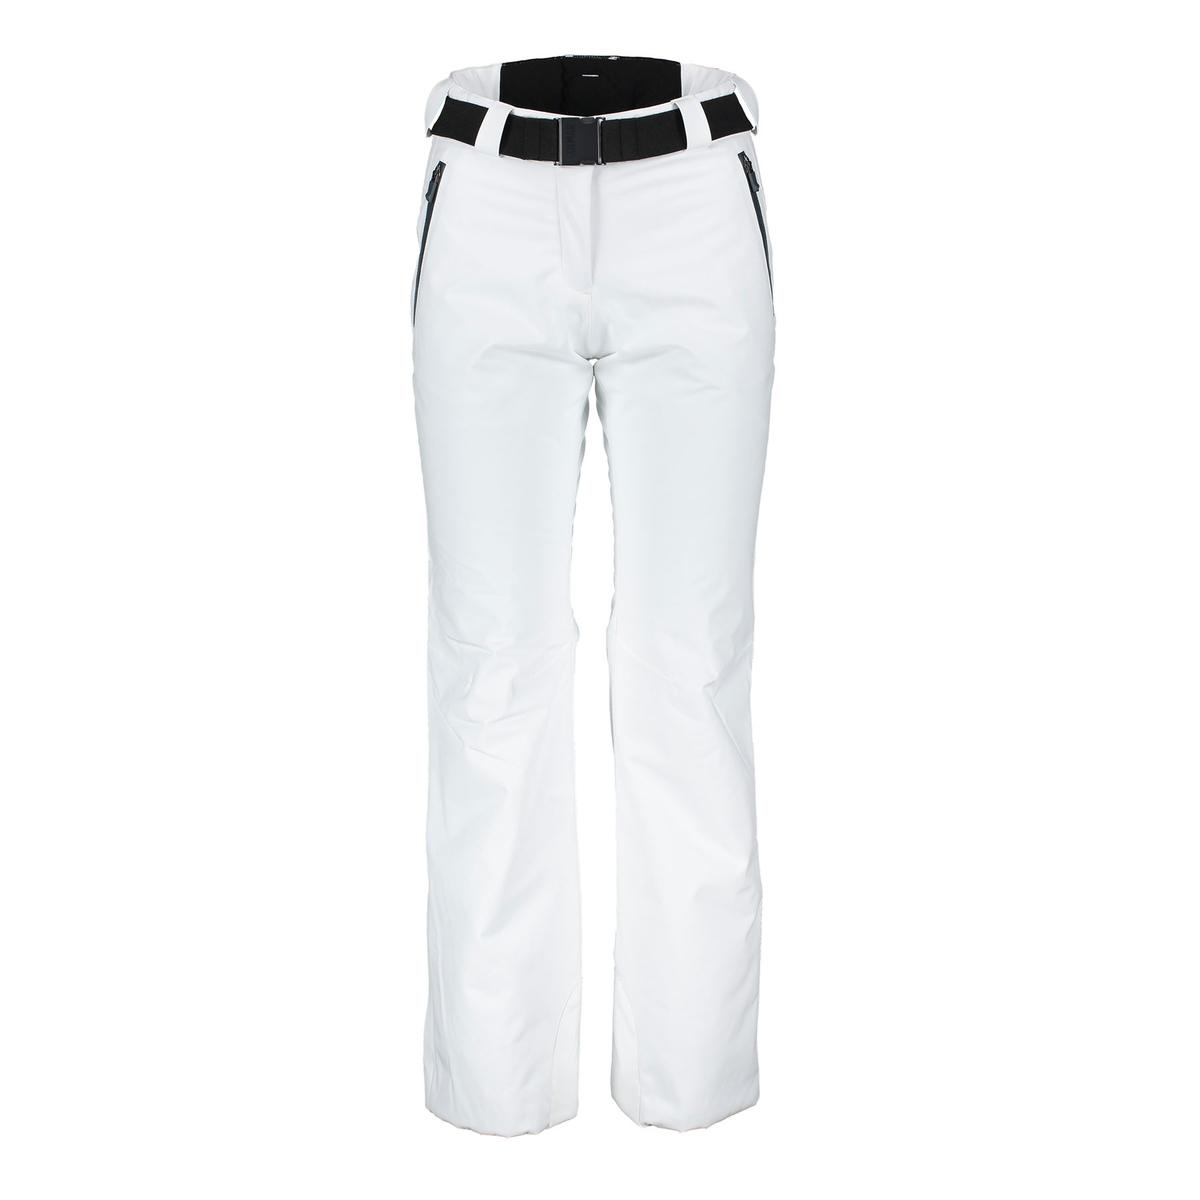 Prezzi Colmar pantaloni evolution donna